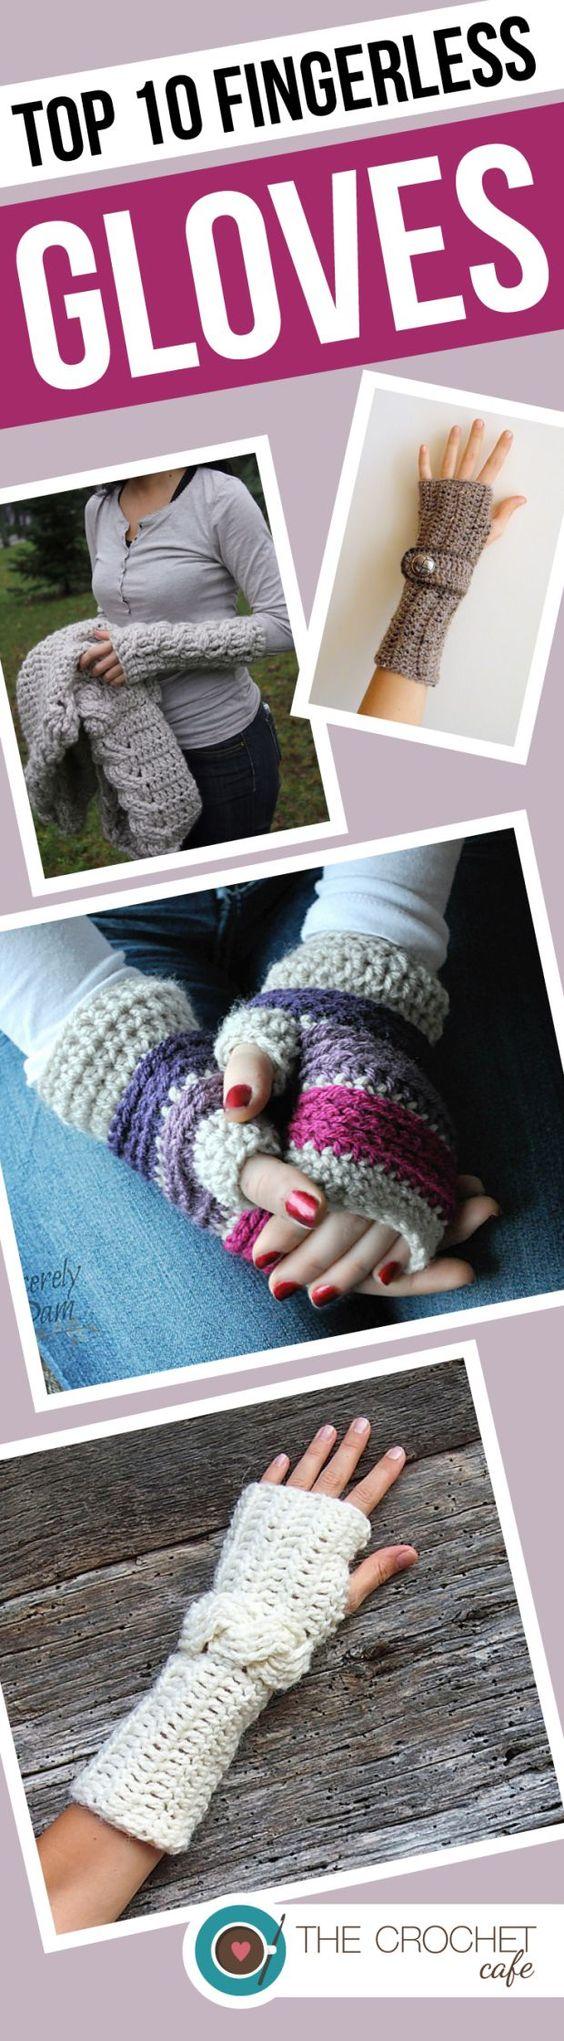 Roundup Of 10 Crochet Patterns For Fingerless Gloves And